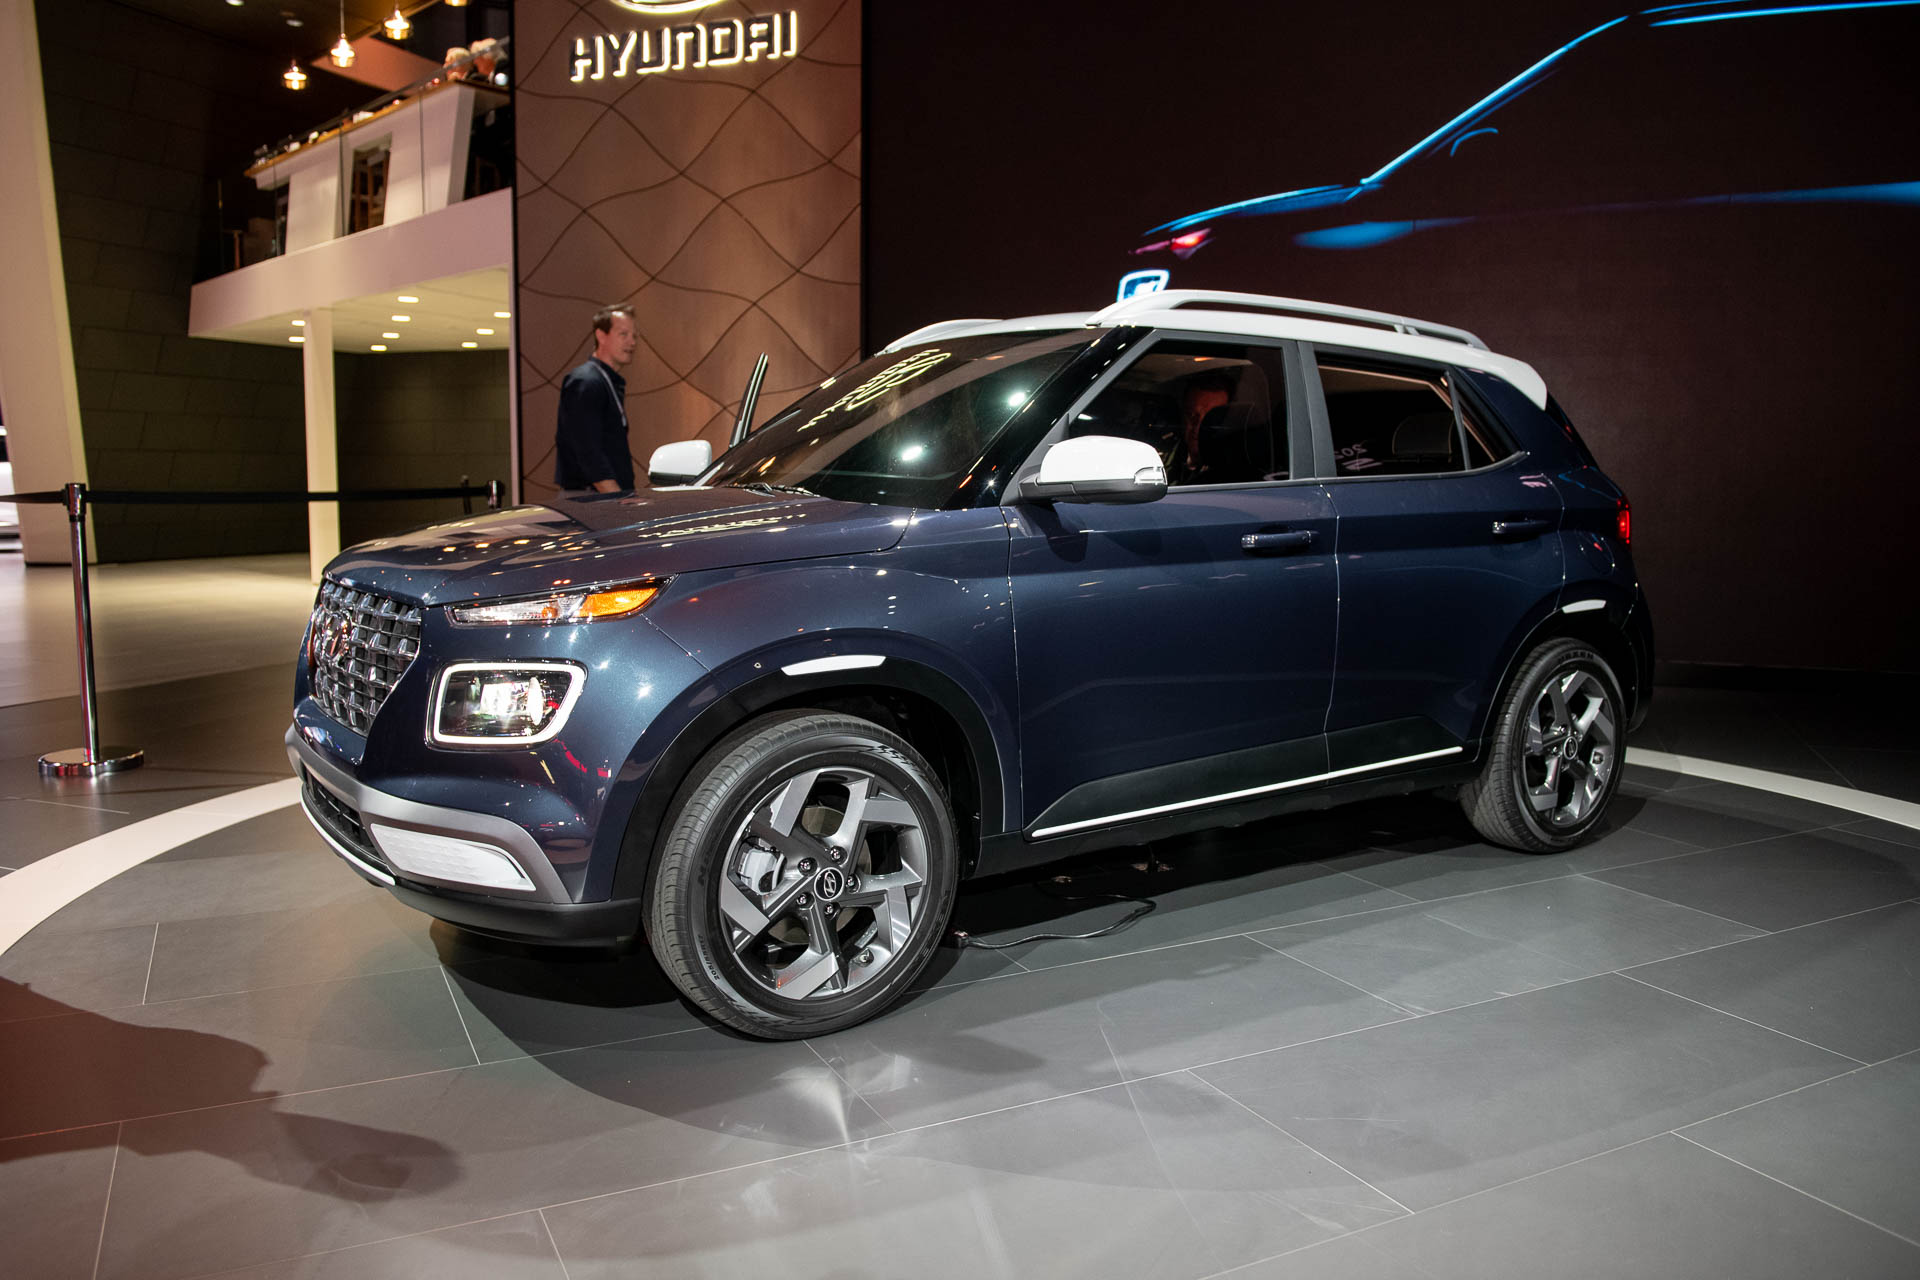 Hyundai Unveils Its Smallest Venue Crossover 13